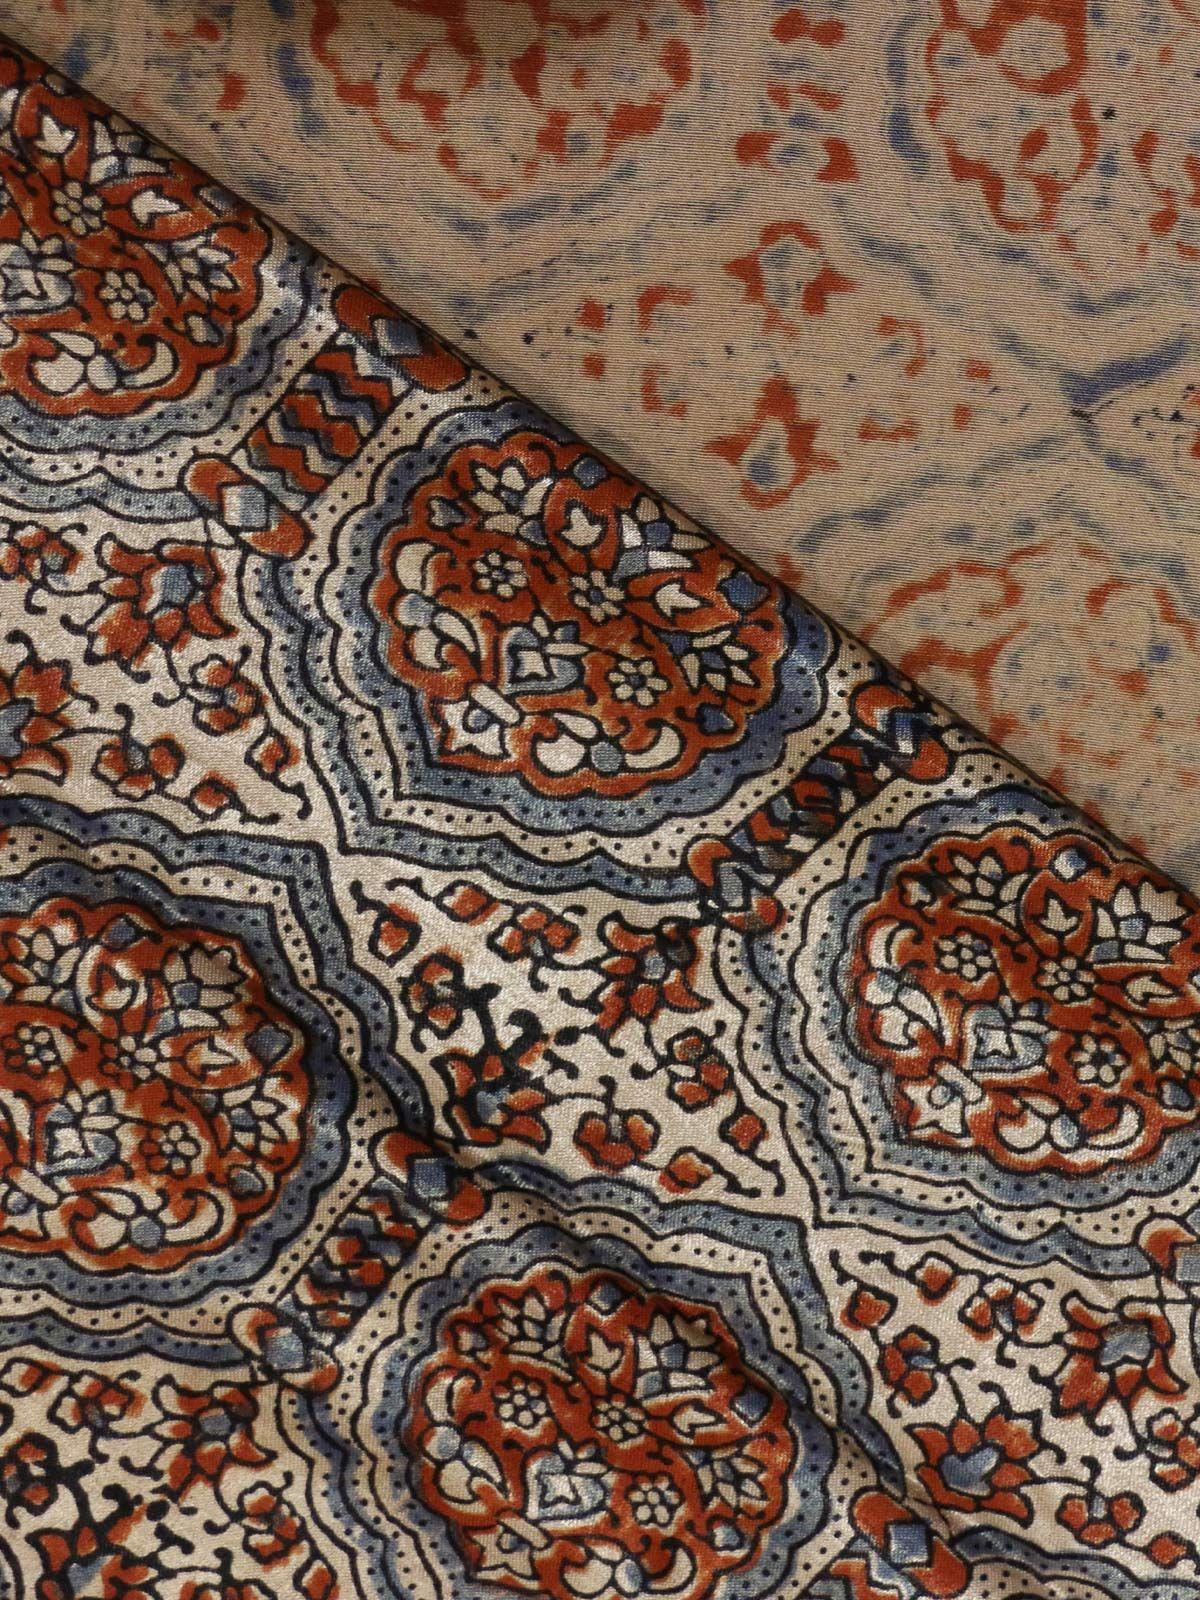 Indigo & Madder Red handblock printed mushroo fabric